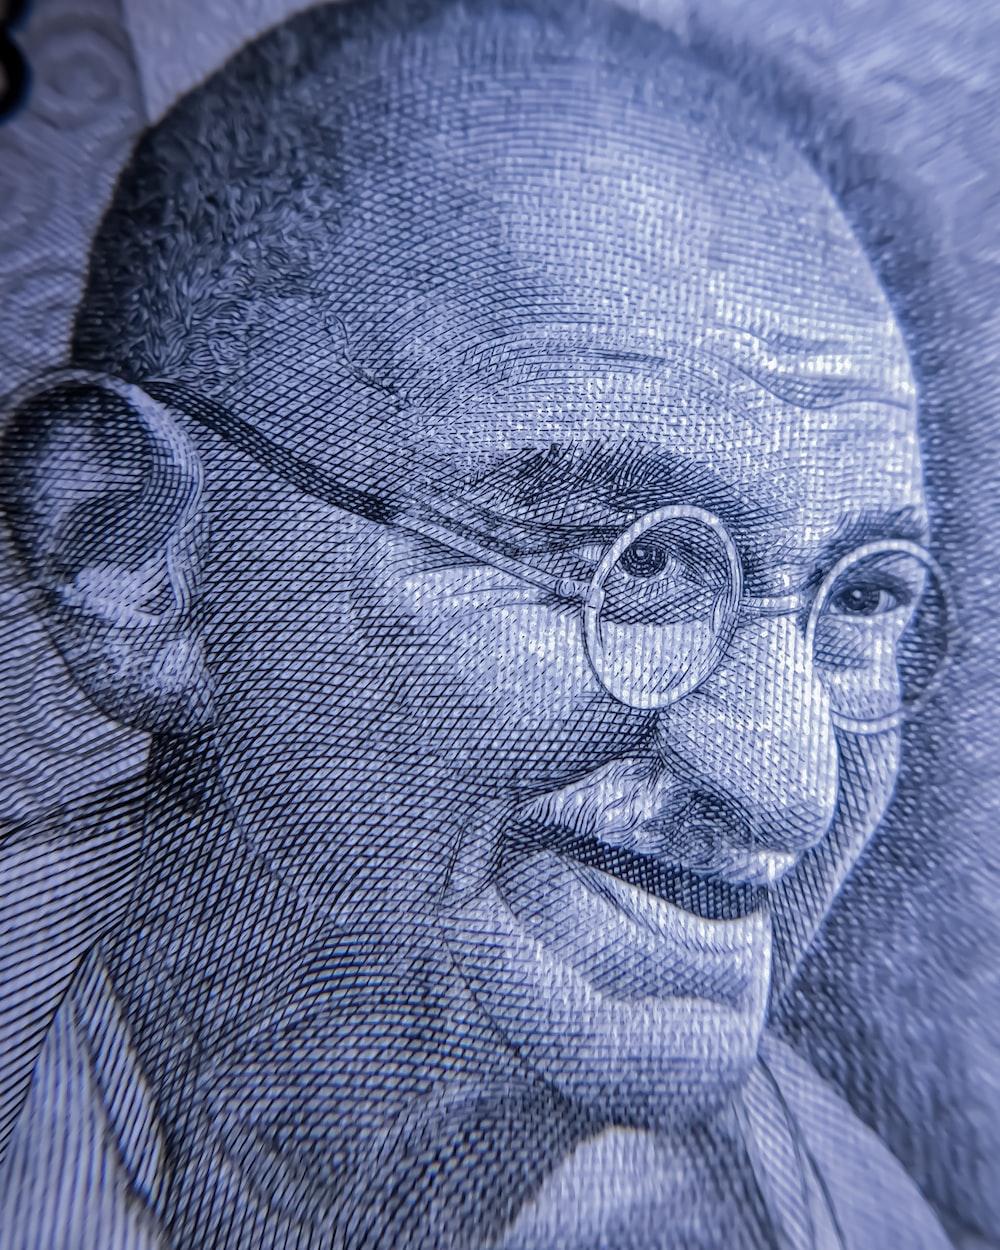 man in black and white plaid shirt wearing eyeglasses